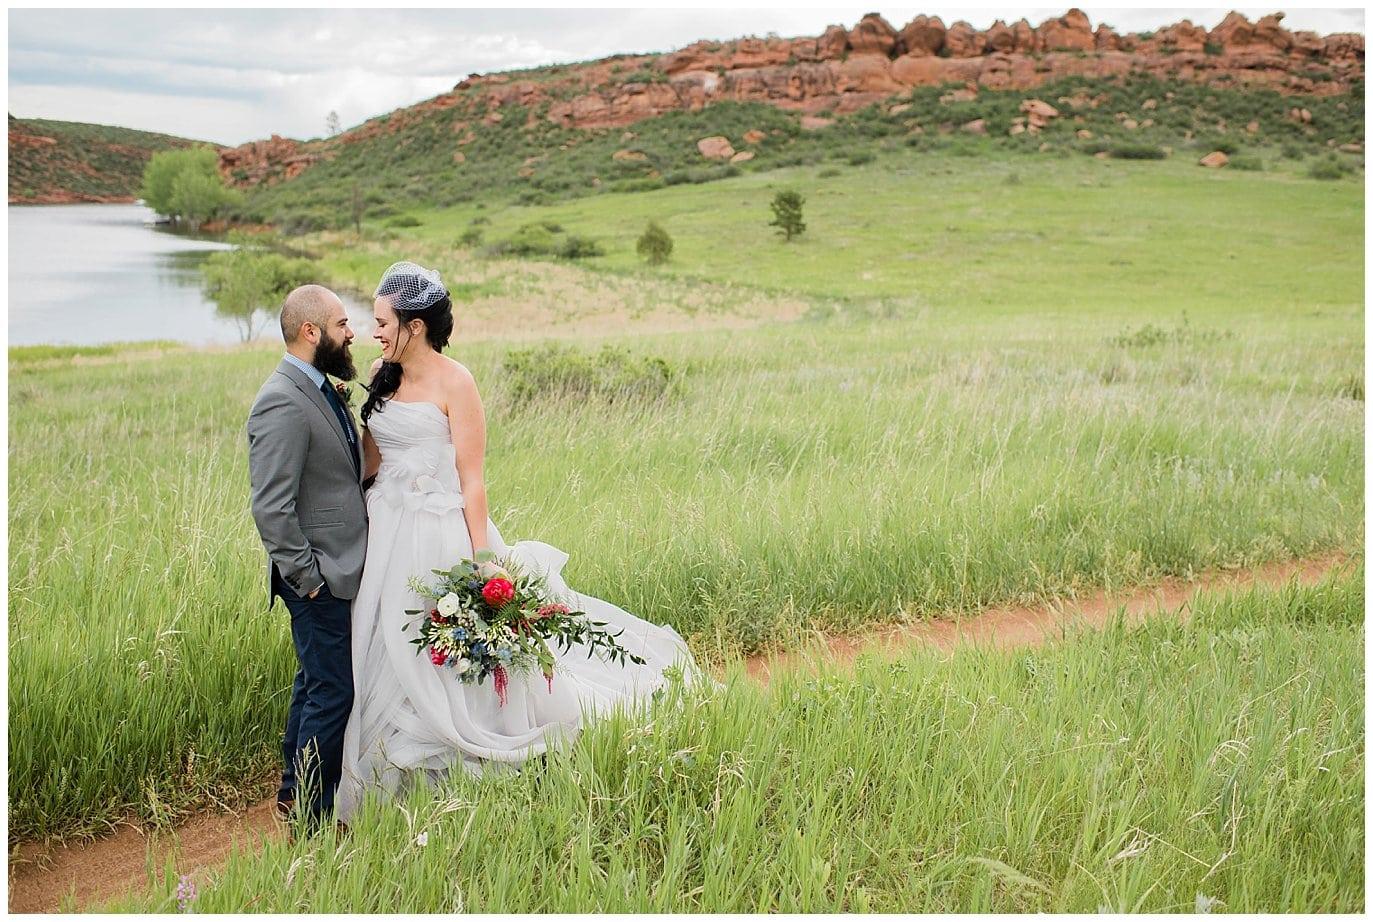 Lory State Park wedding photo